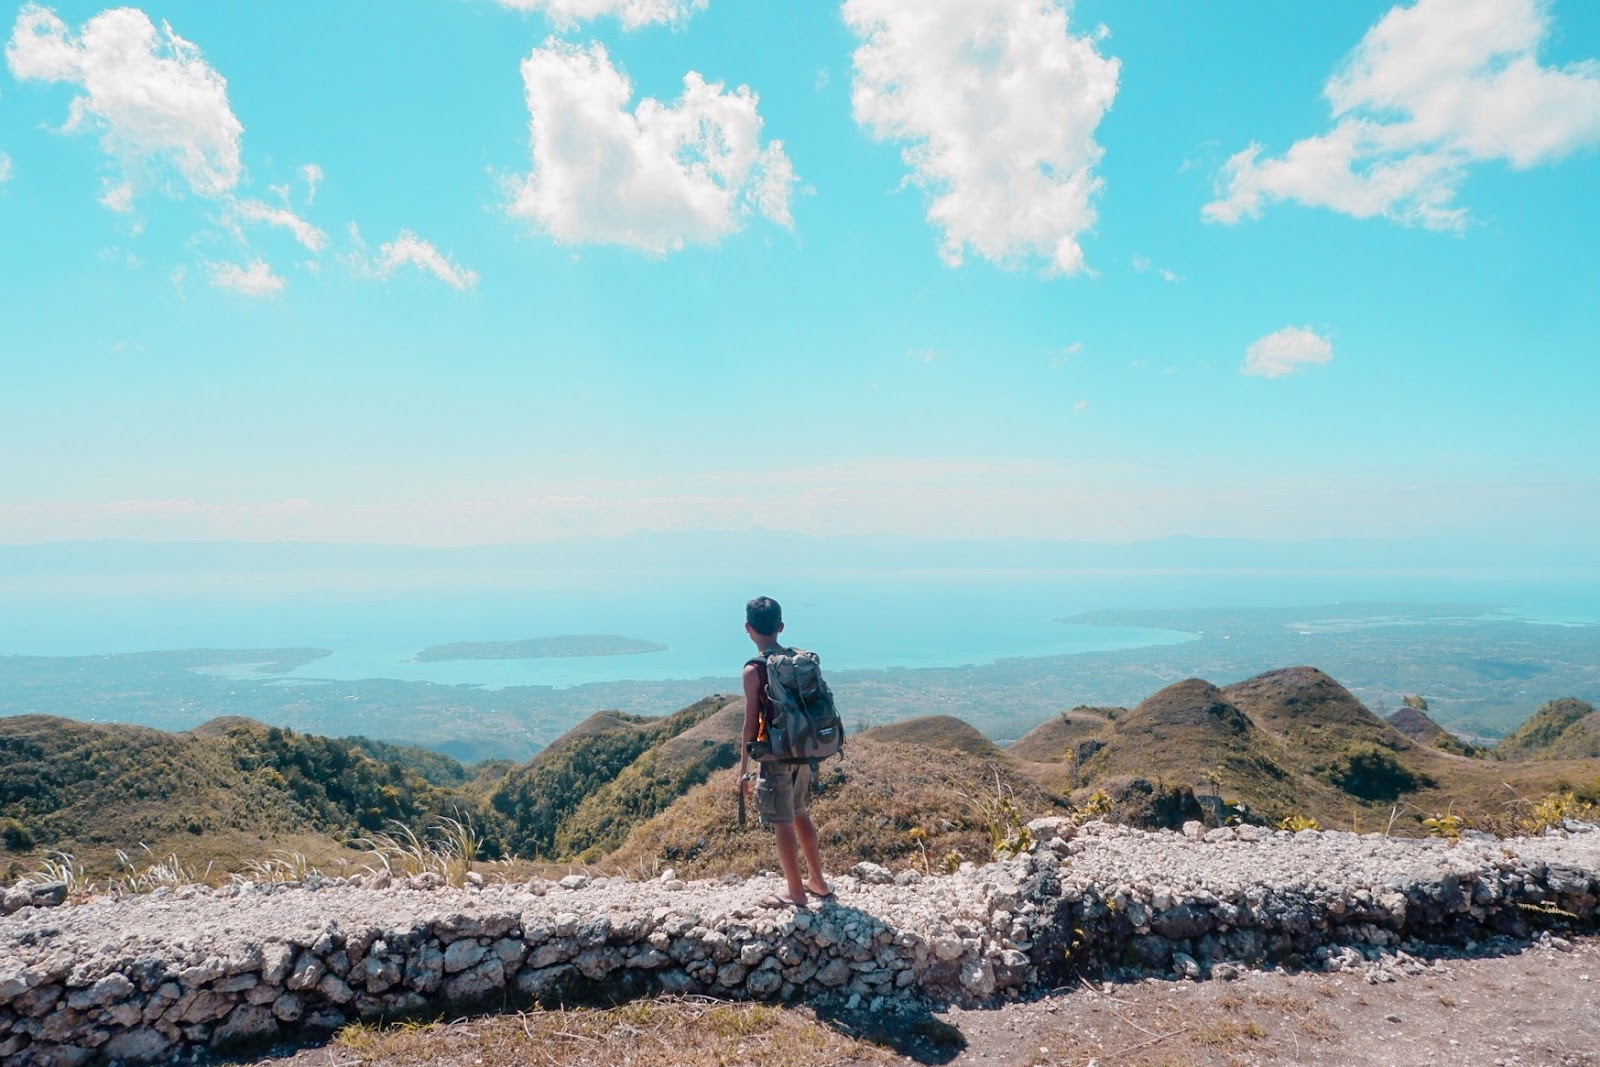 Mt. Kandungaw: Not for the faint-hearted